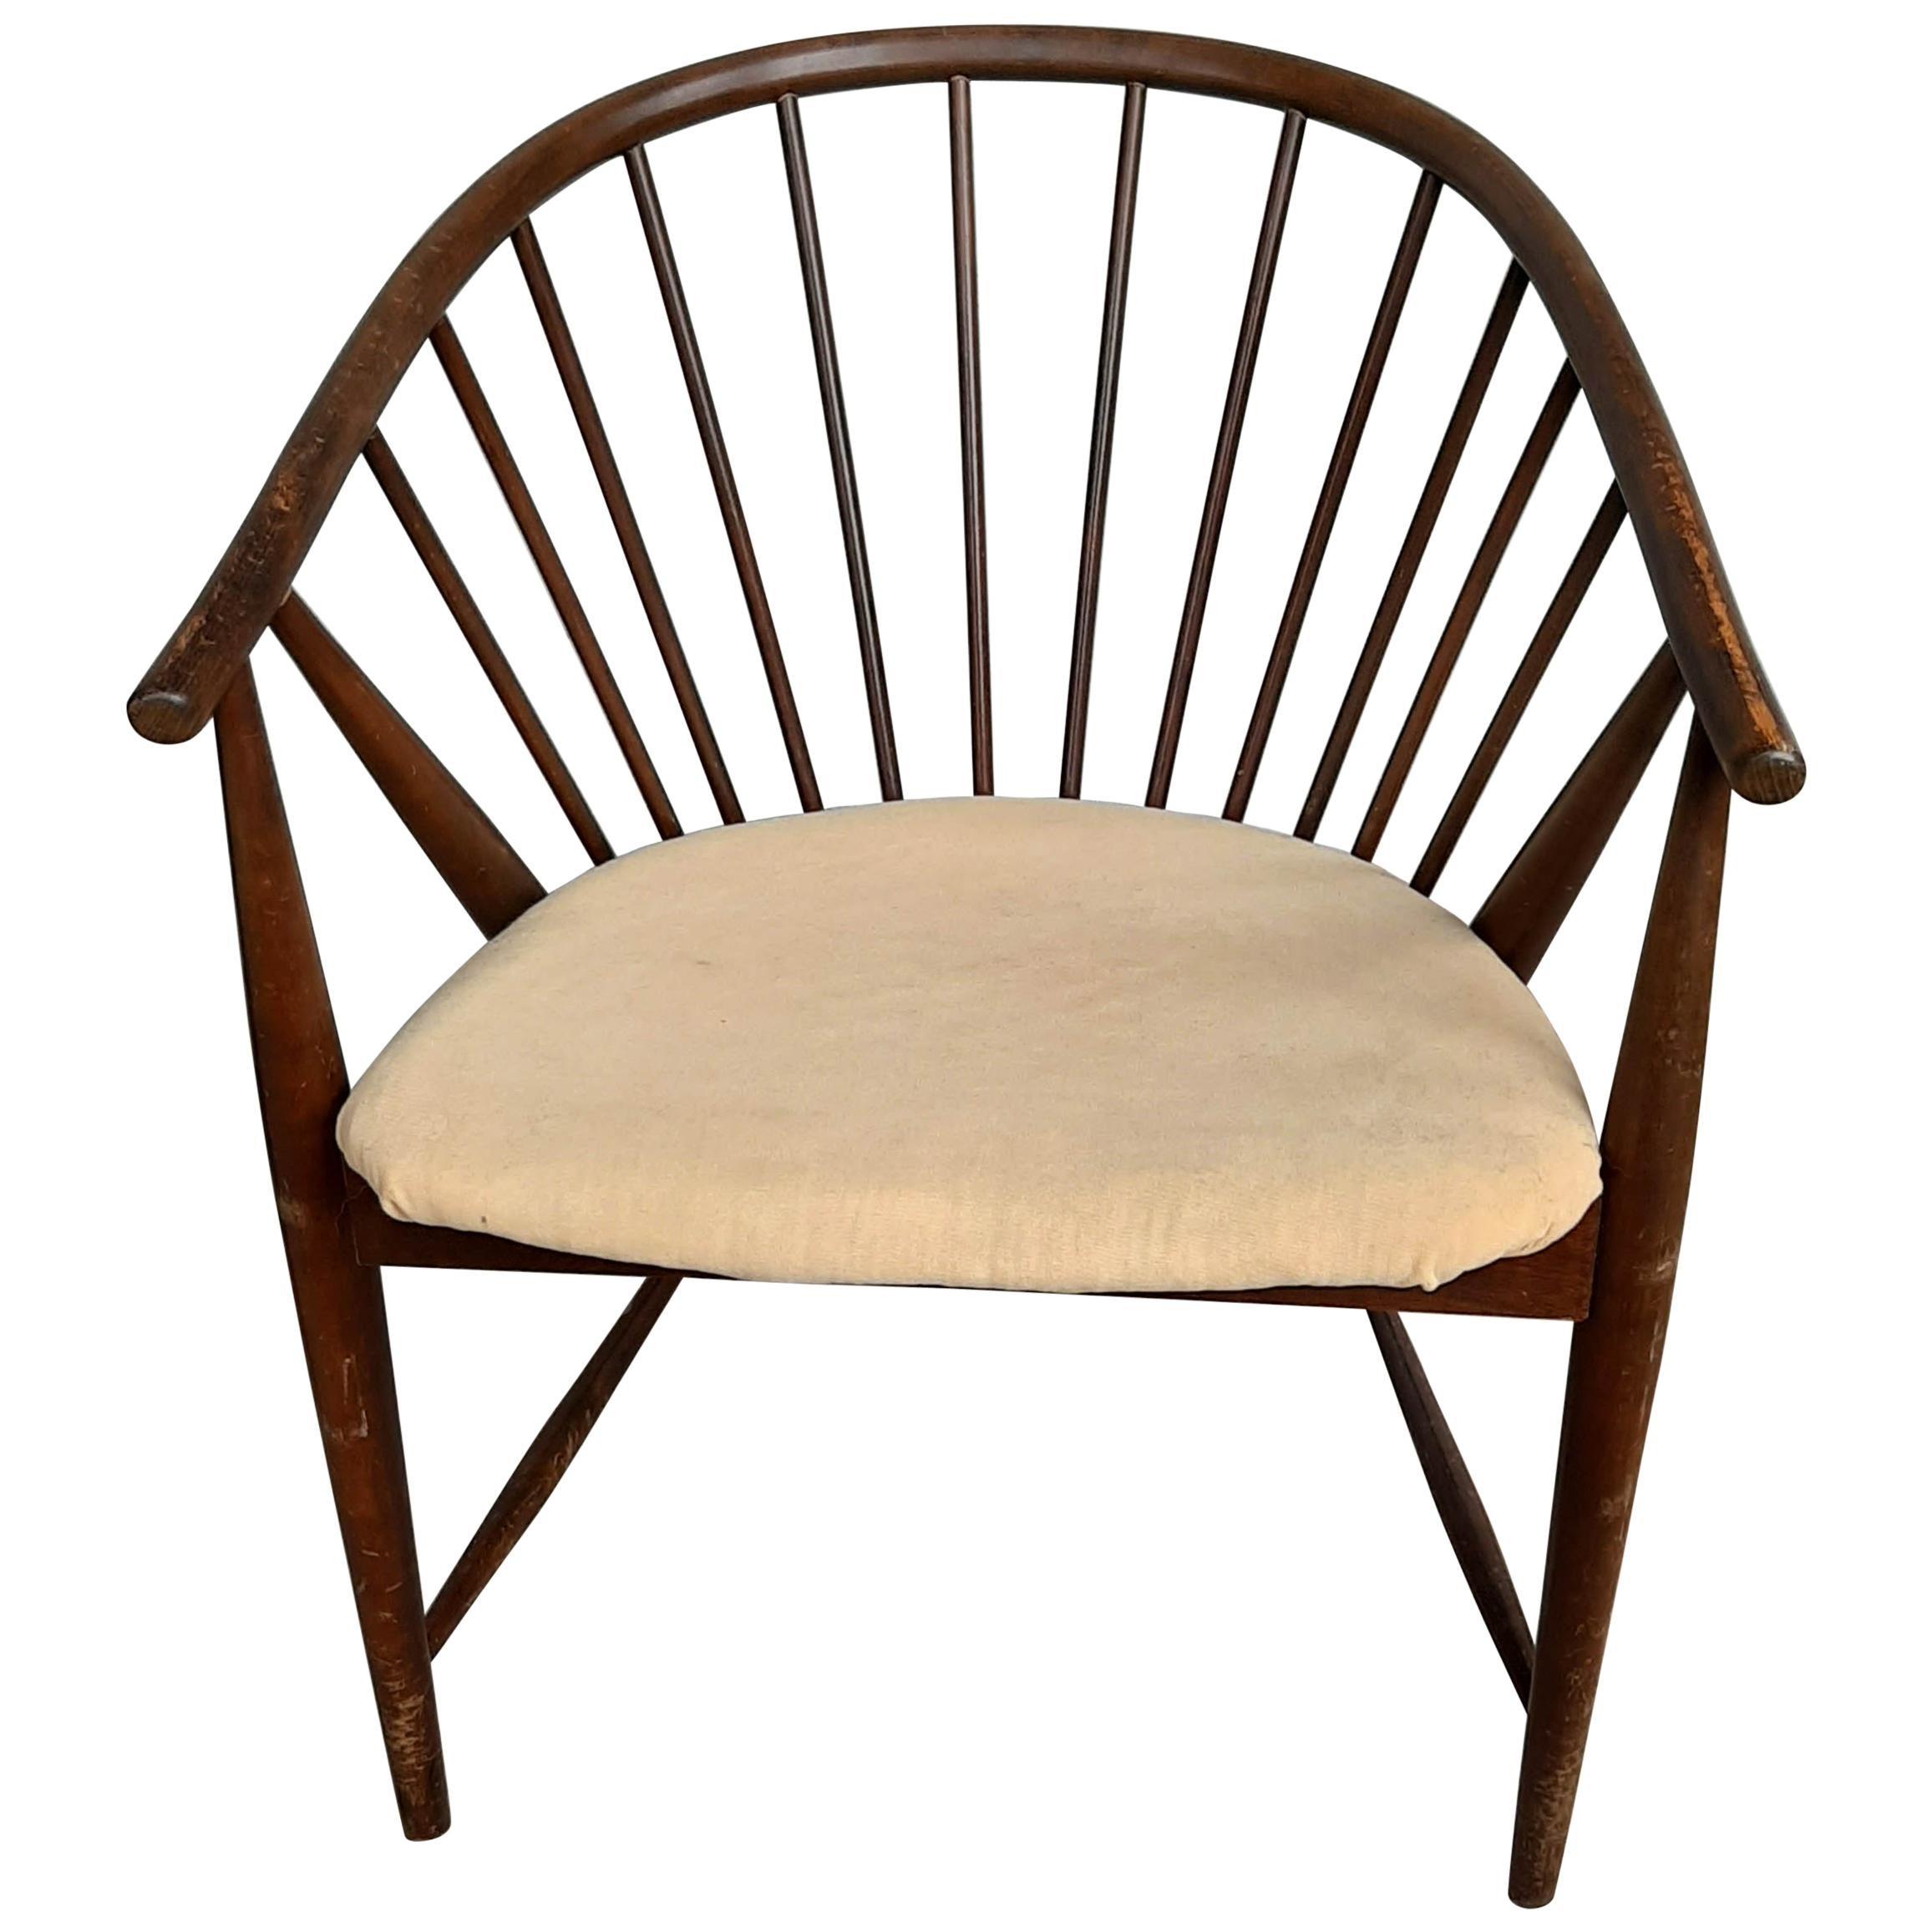 Midcentury Scandinavian Sunfeather Chair by Sonna Rosen